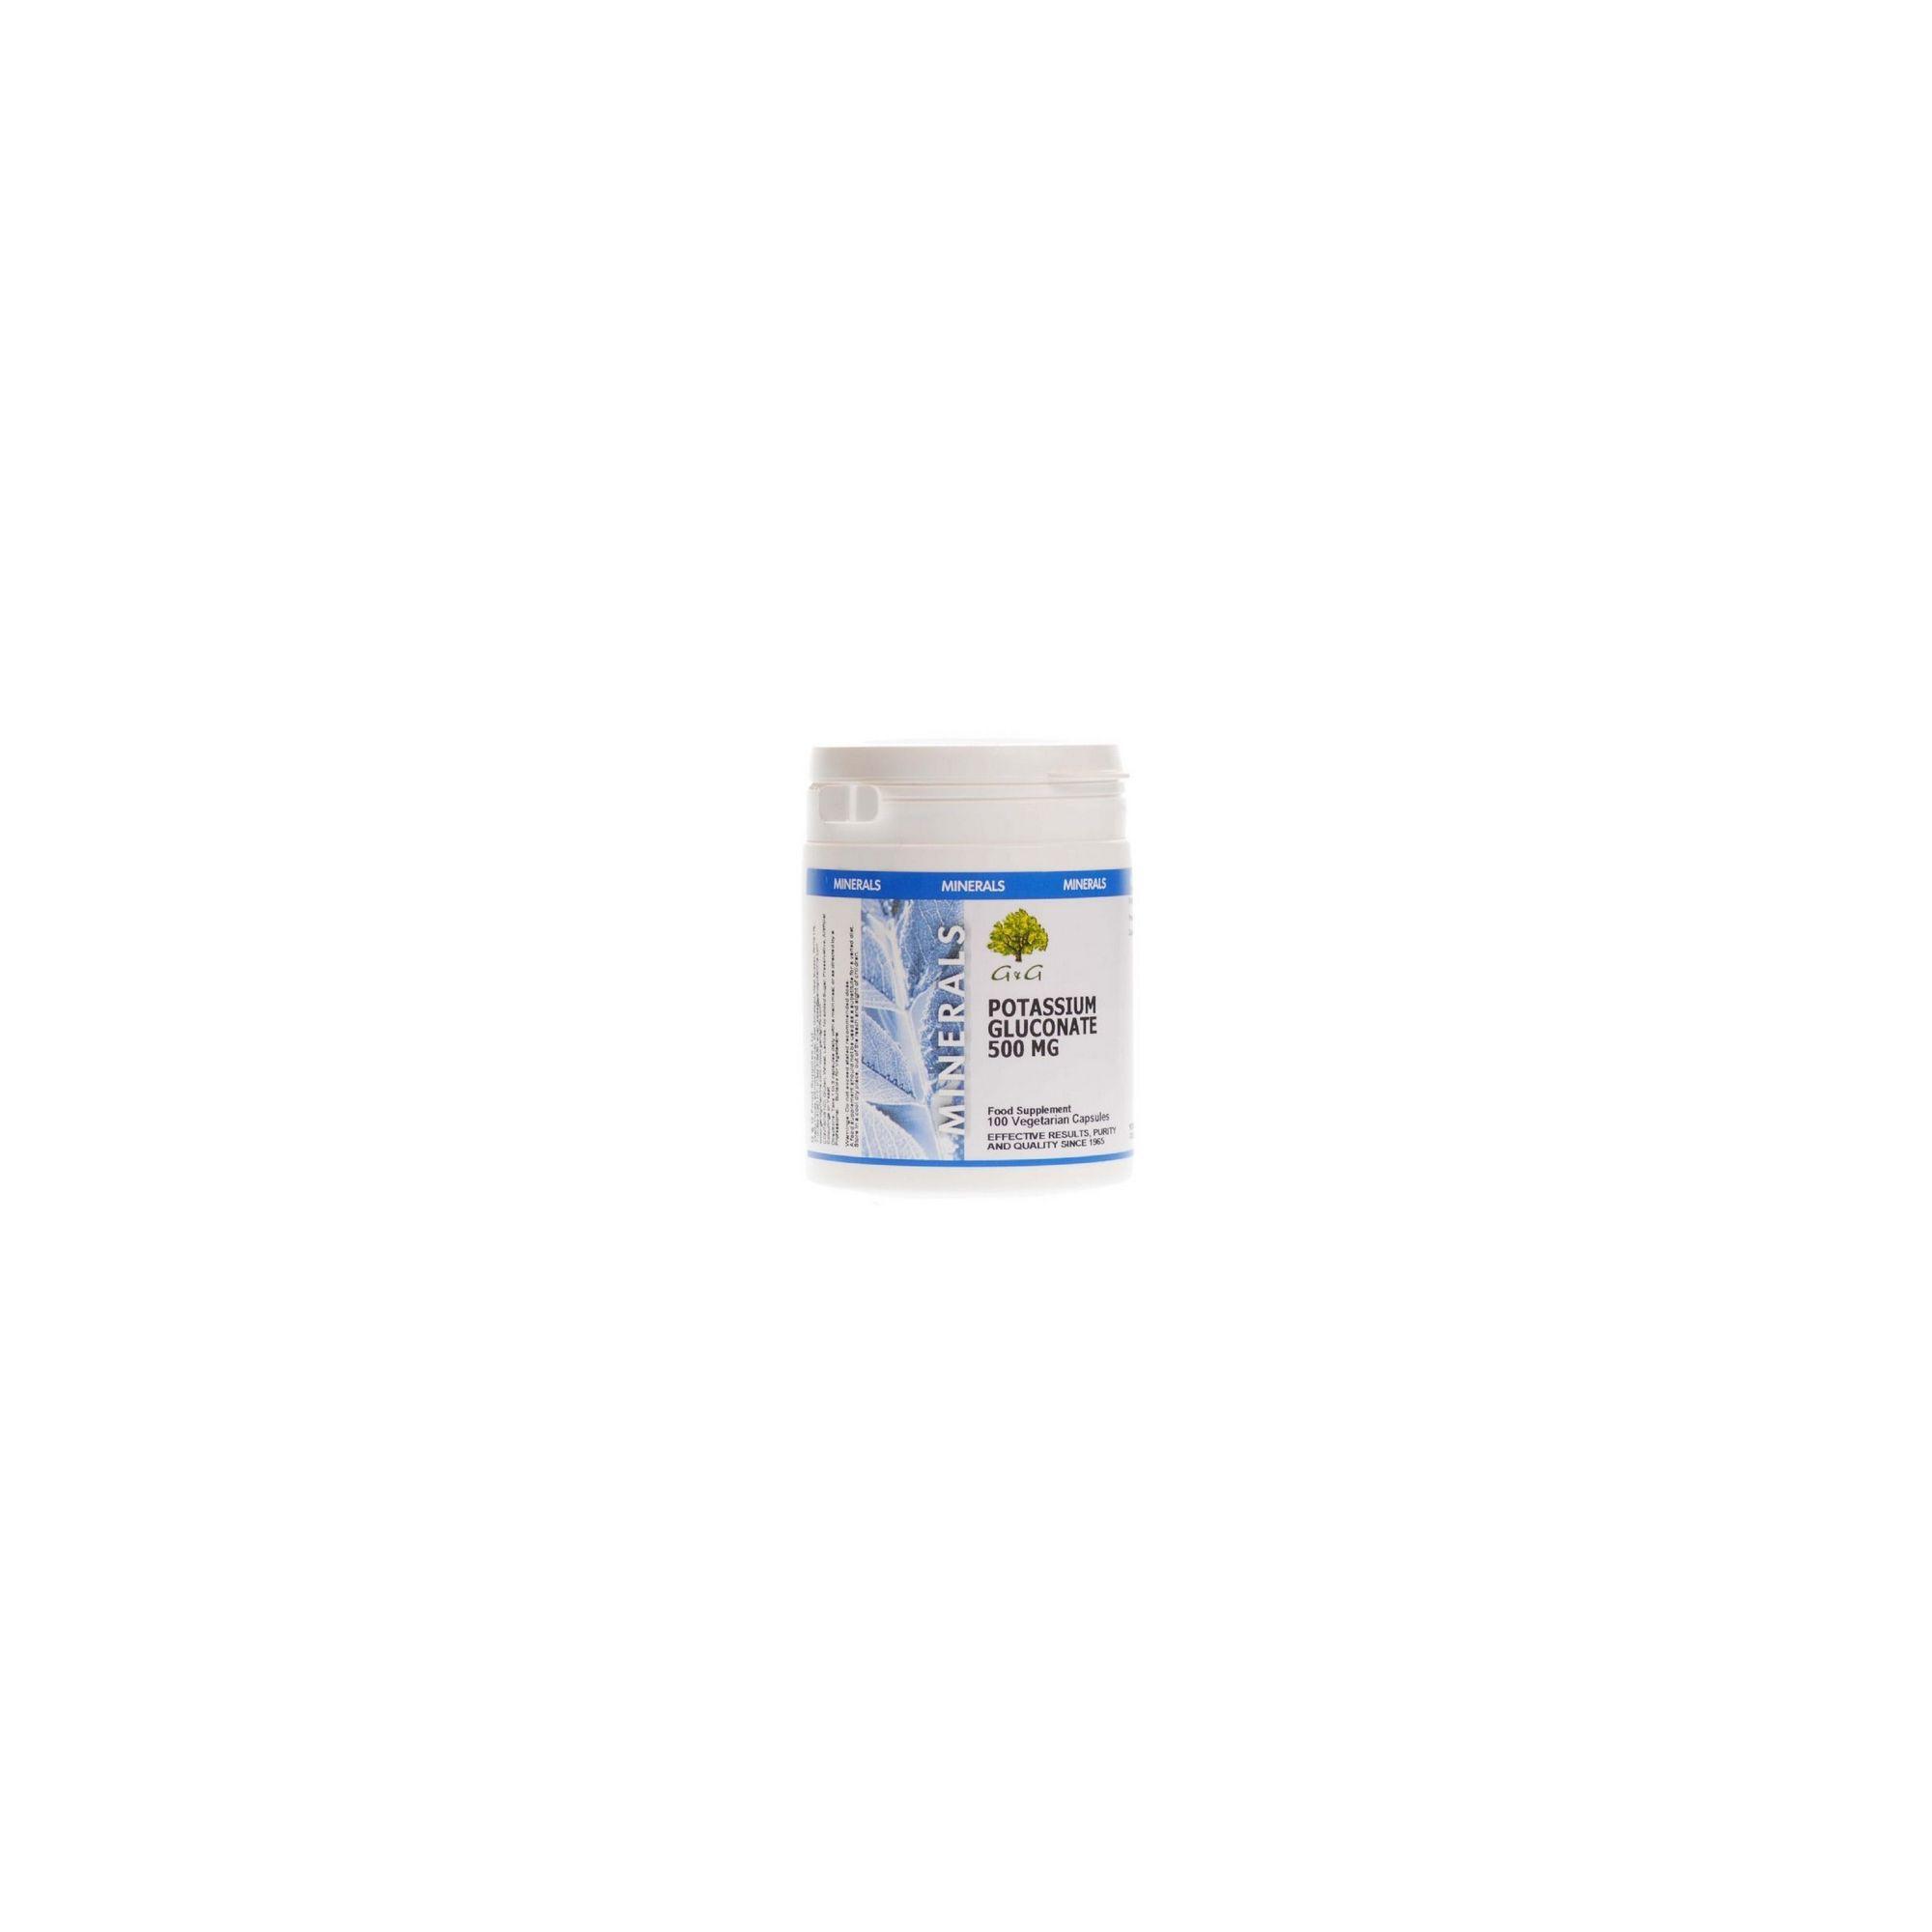 g-g-potassium-gluconate-500mg-100-capsules